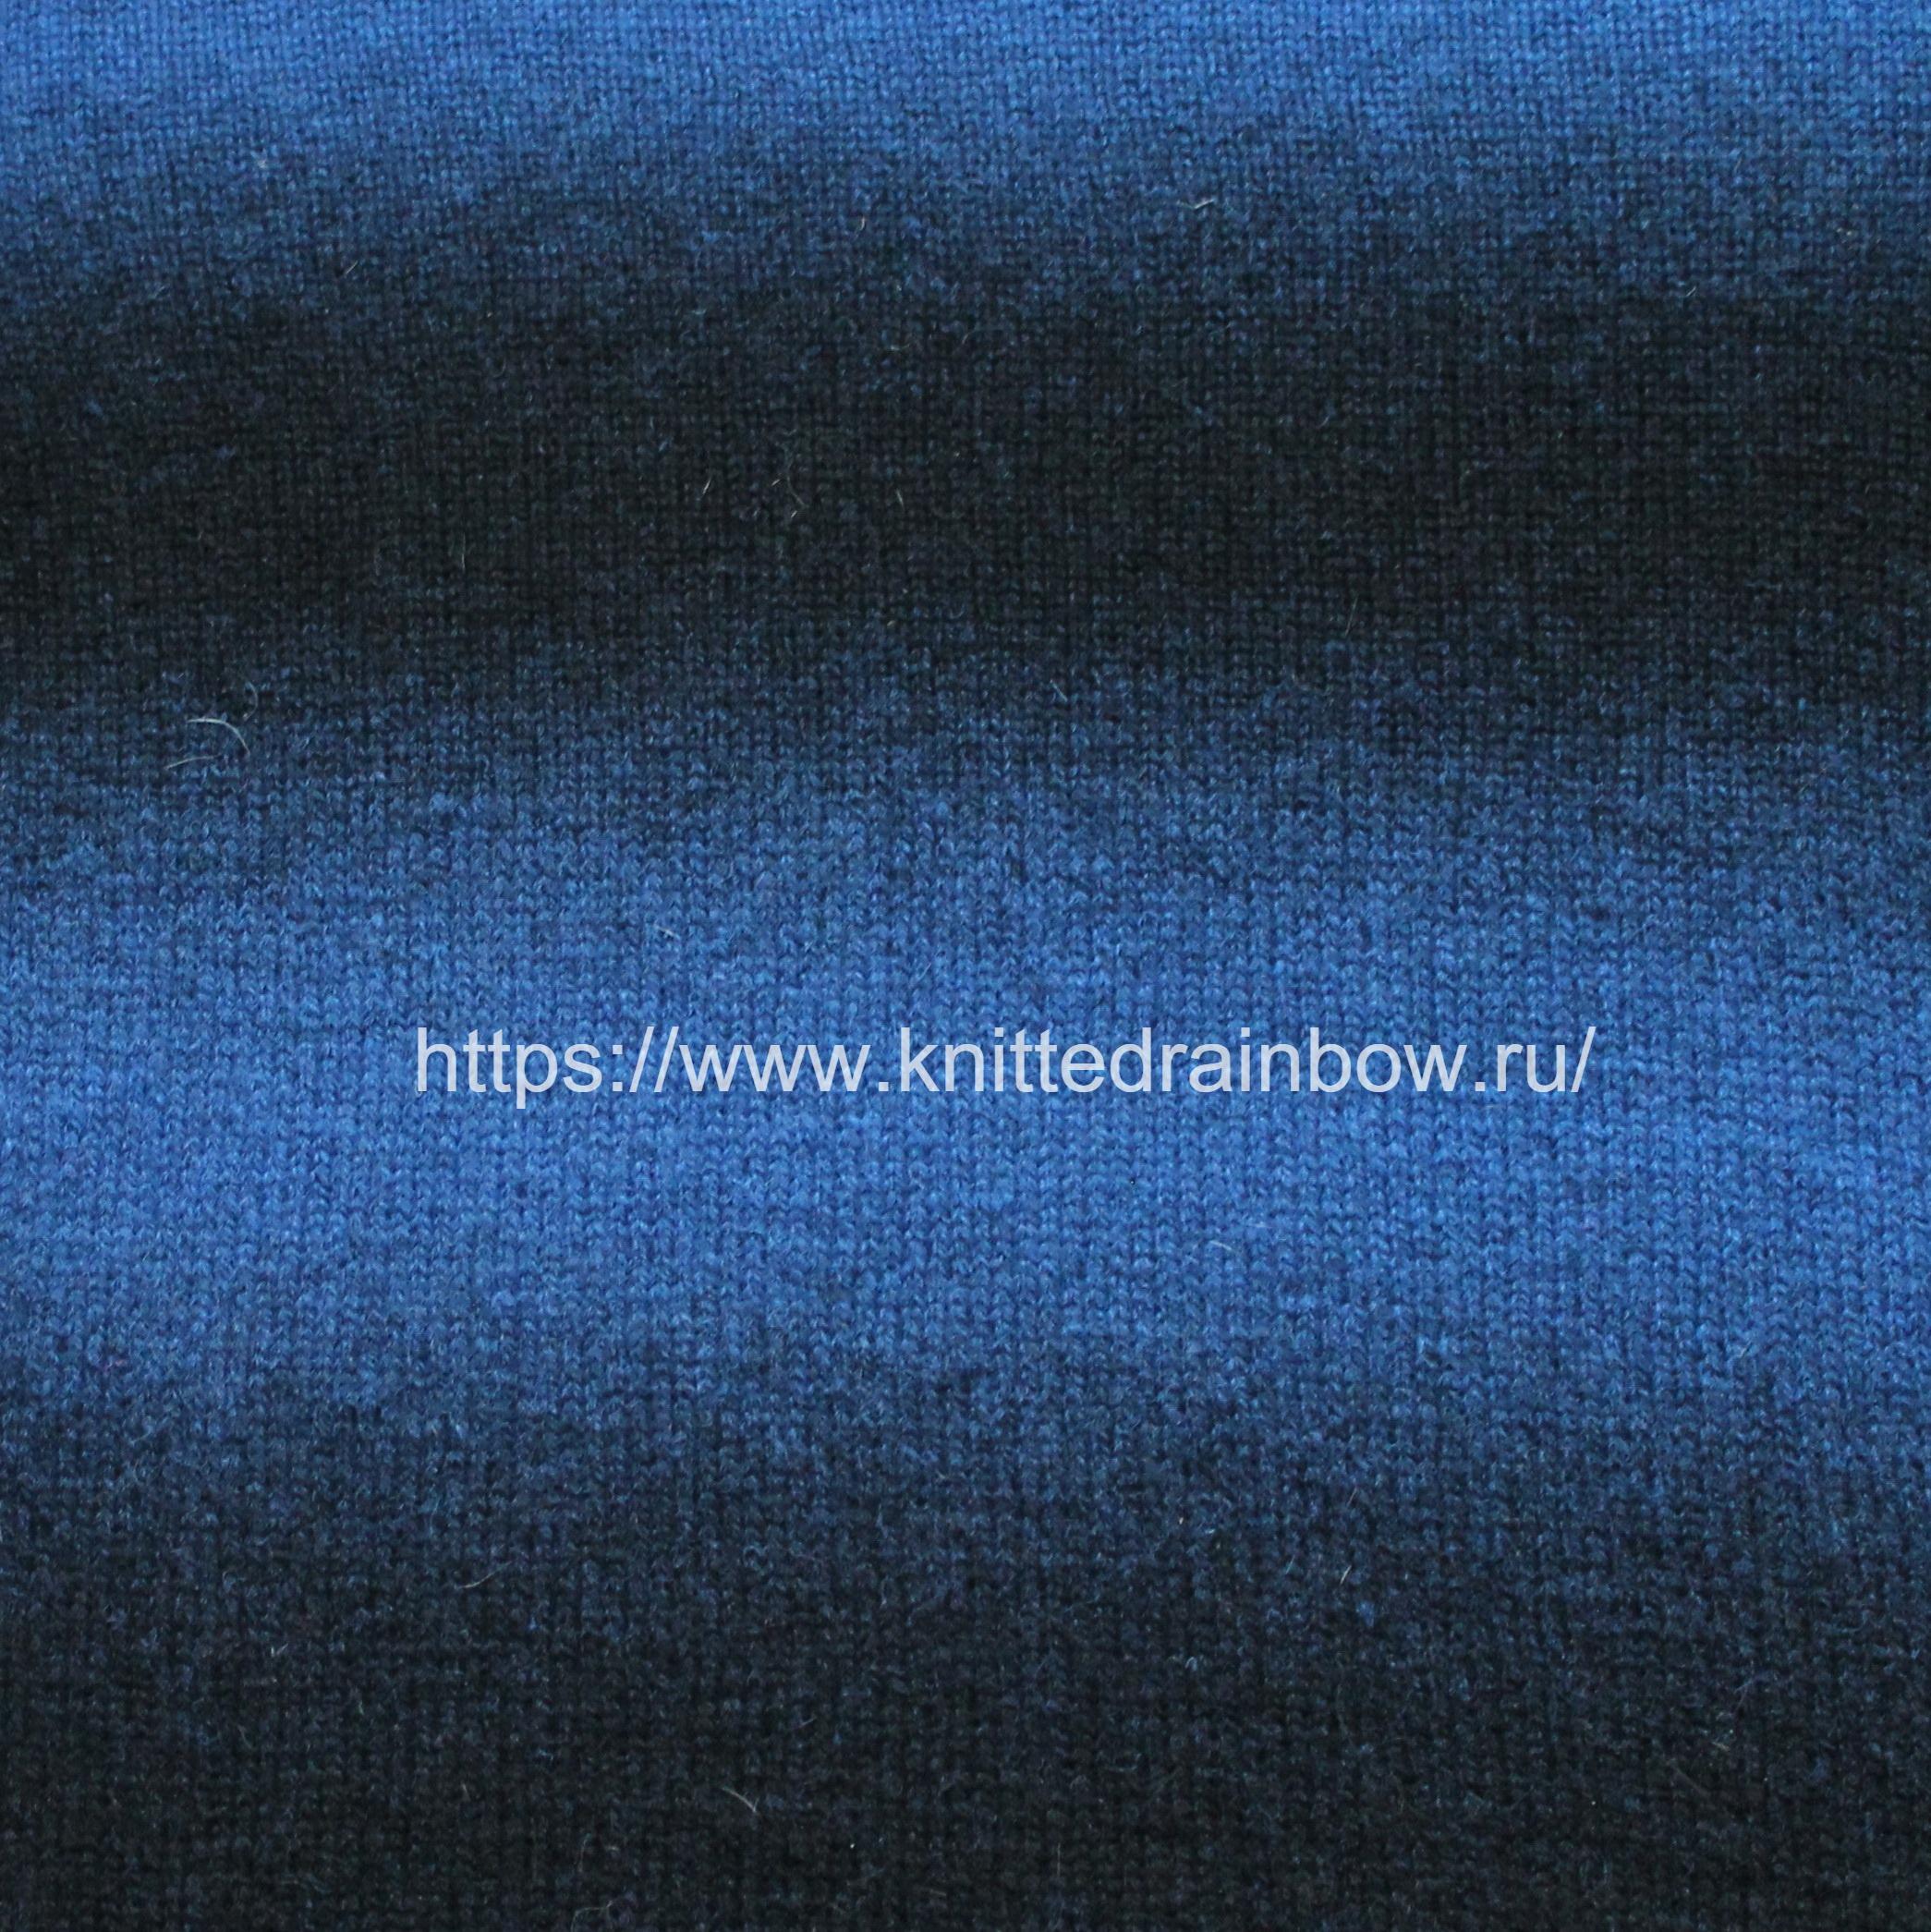 Artistic BLACK-BLUE